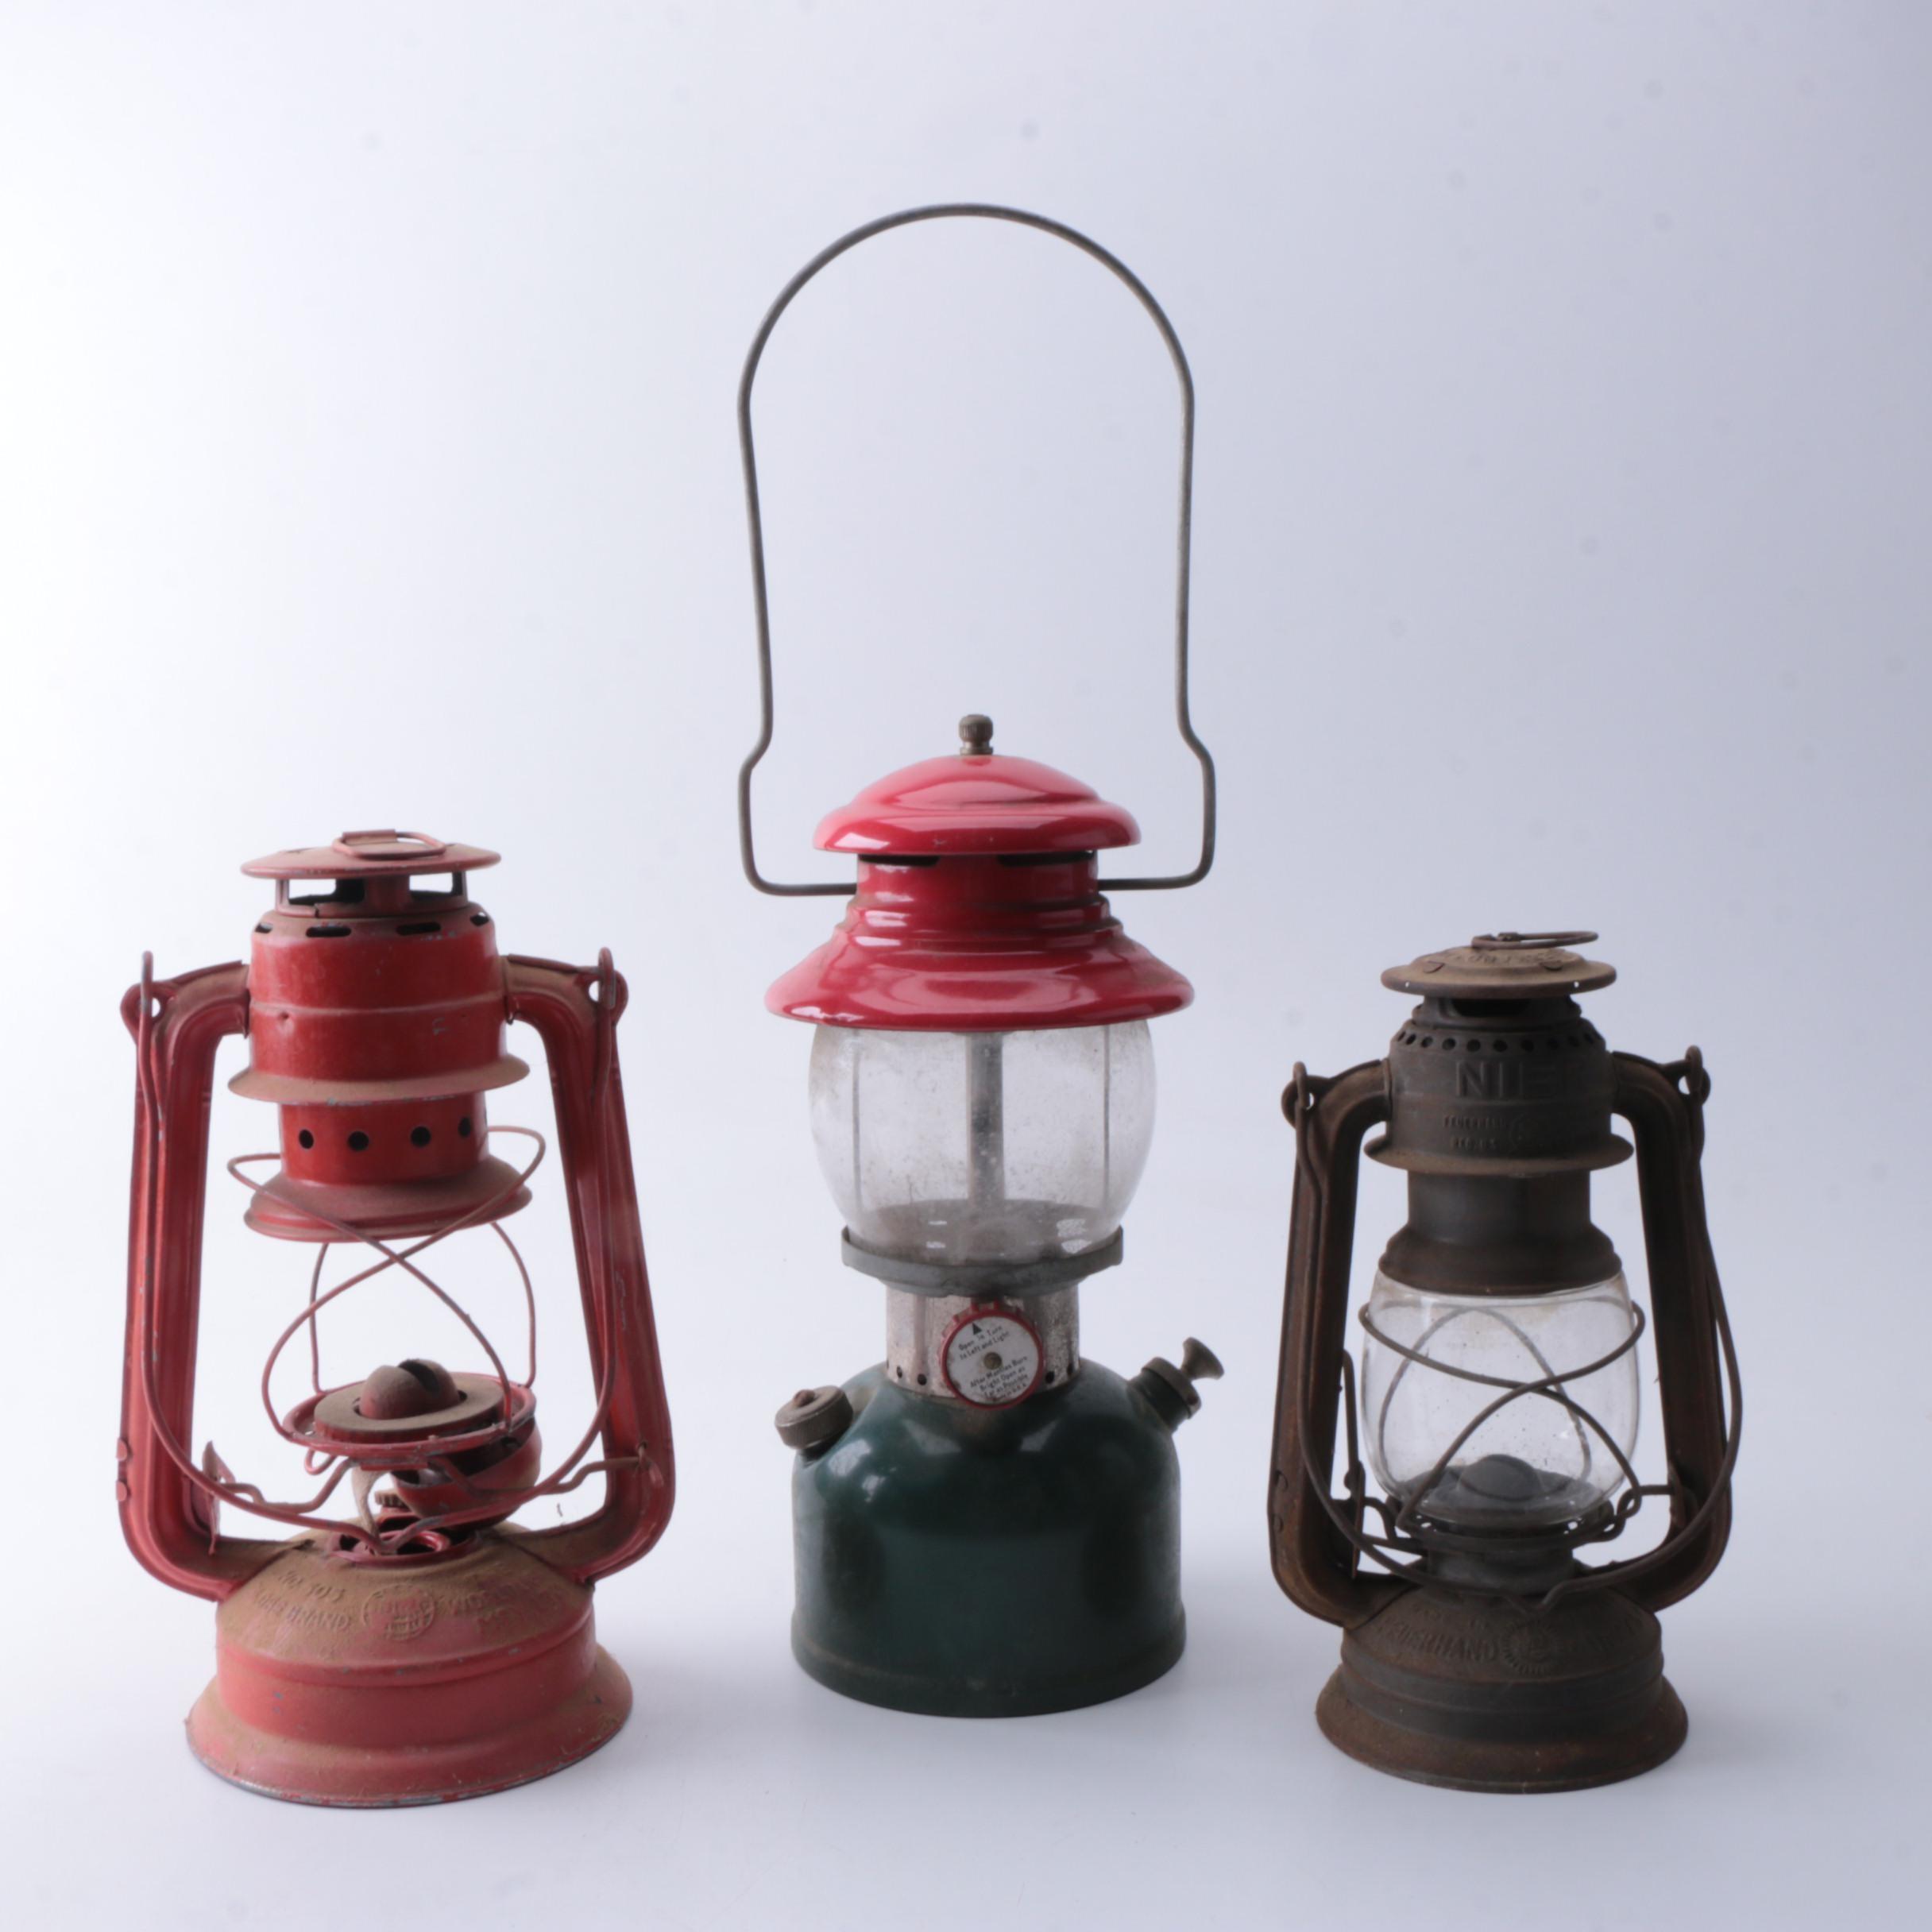 Vintage Railroad Lanterns including German Feuerhand